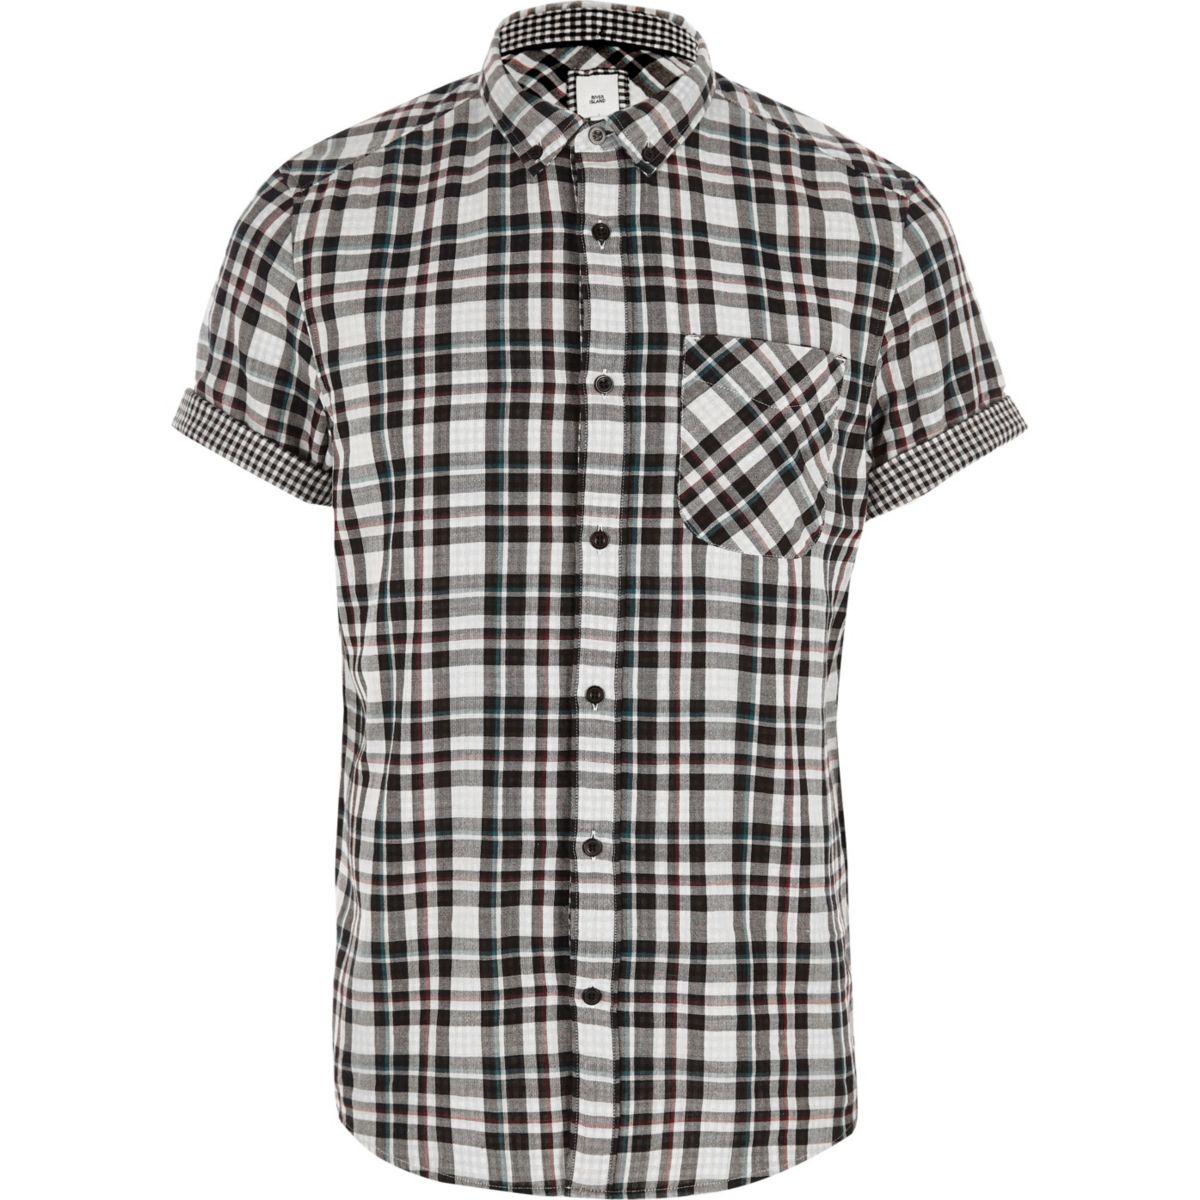 short White check shirt double face sleeve Aw7wYqx